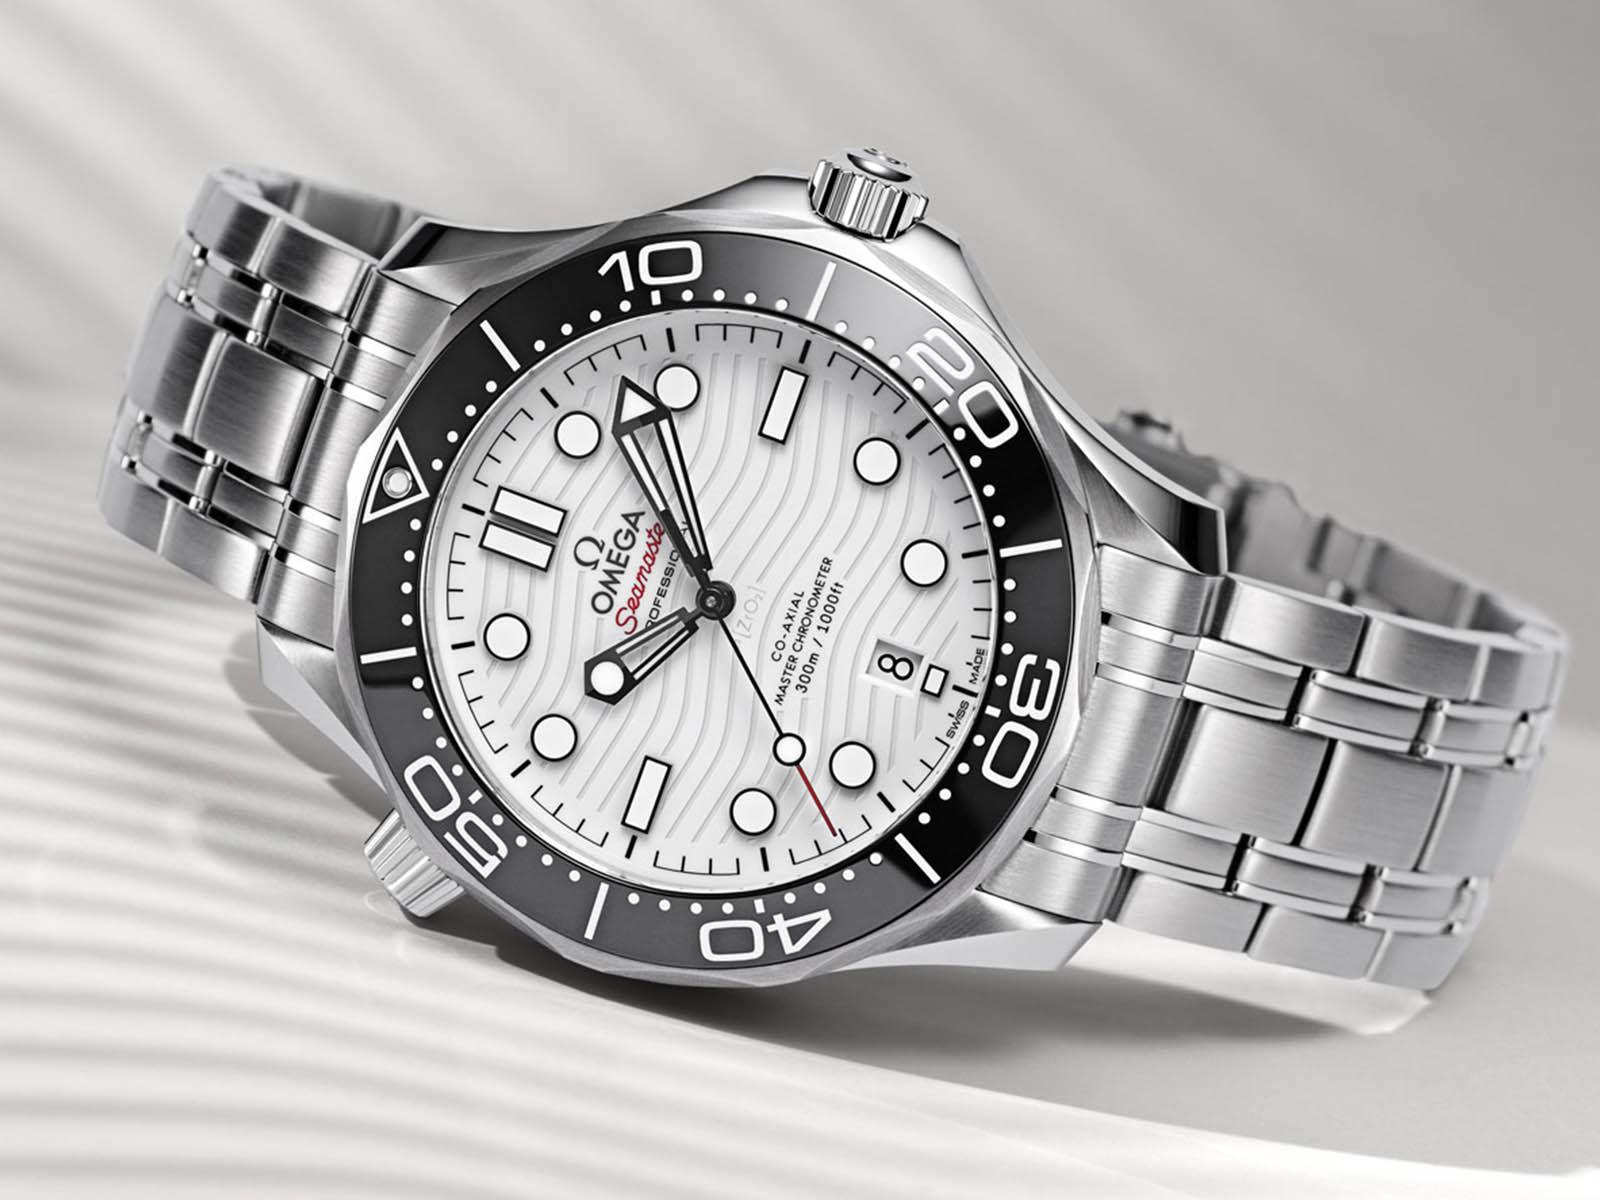 210-30-42-20-04-001-omega-seamaster-diver-300m-omega-co-axial-master-chronometer-42-mm-1.jpg